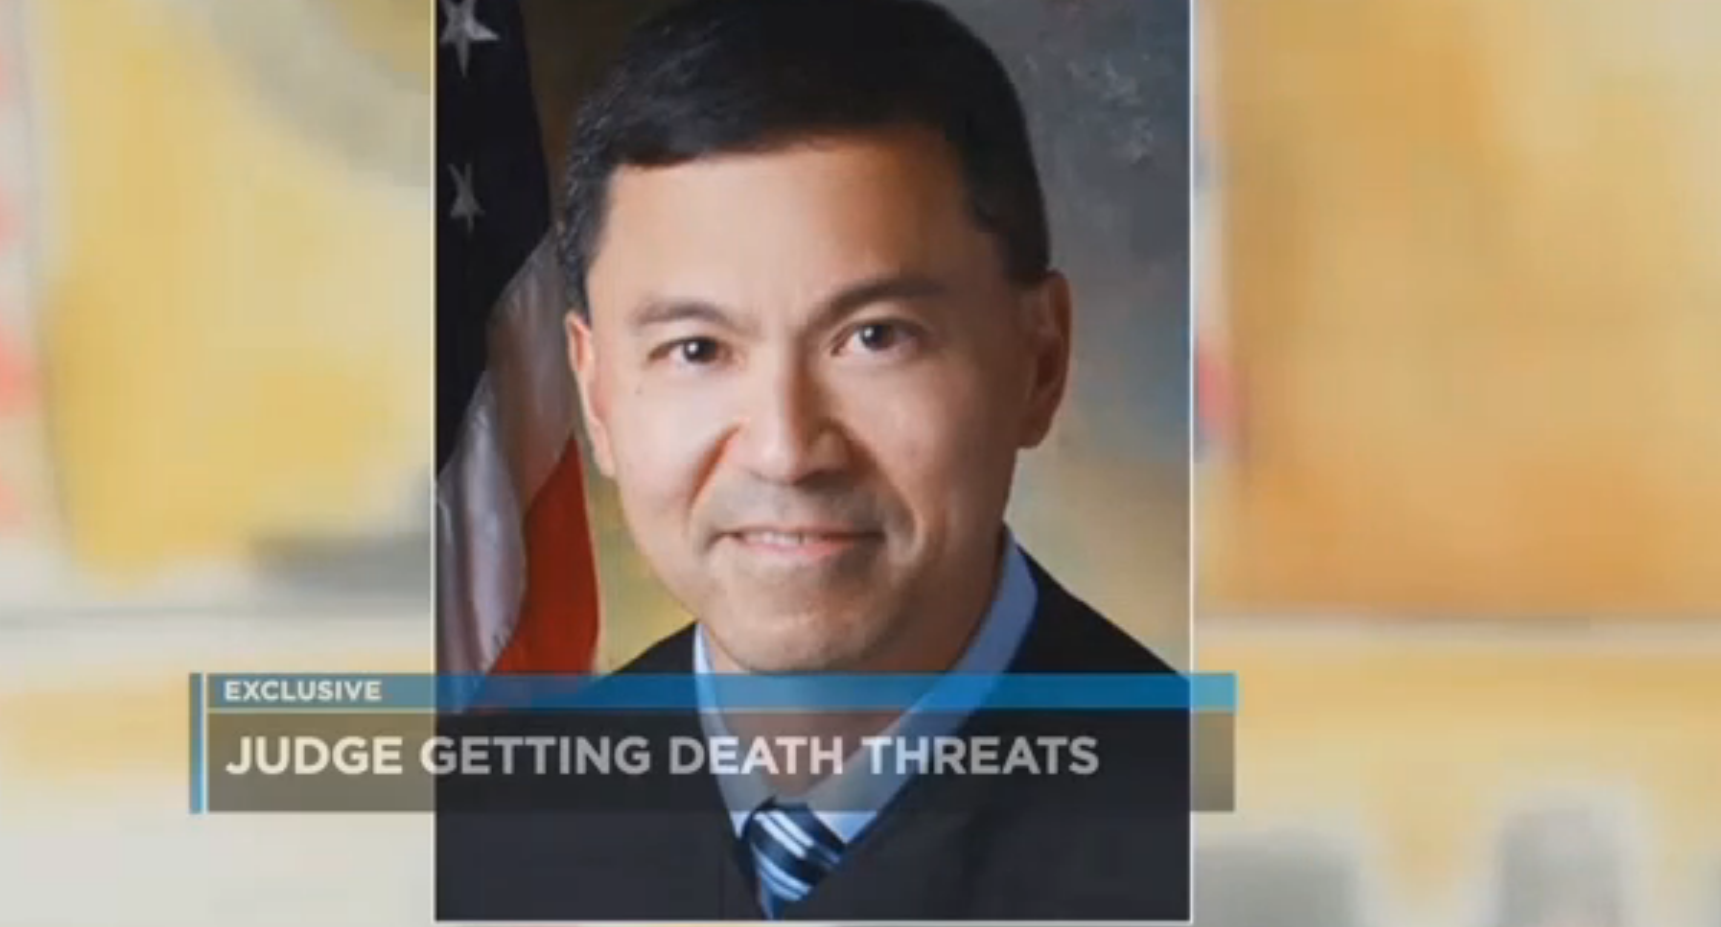 Hawaii judge who blocked Trump travel ban now receiving threats, FBI says